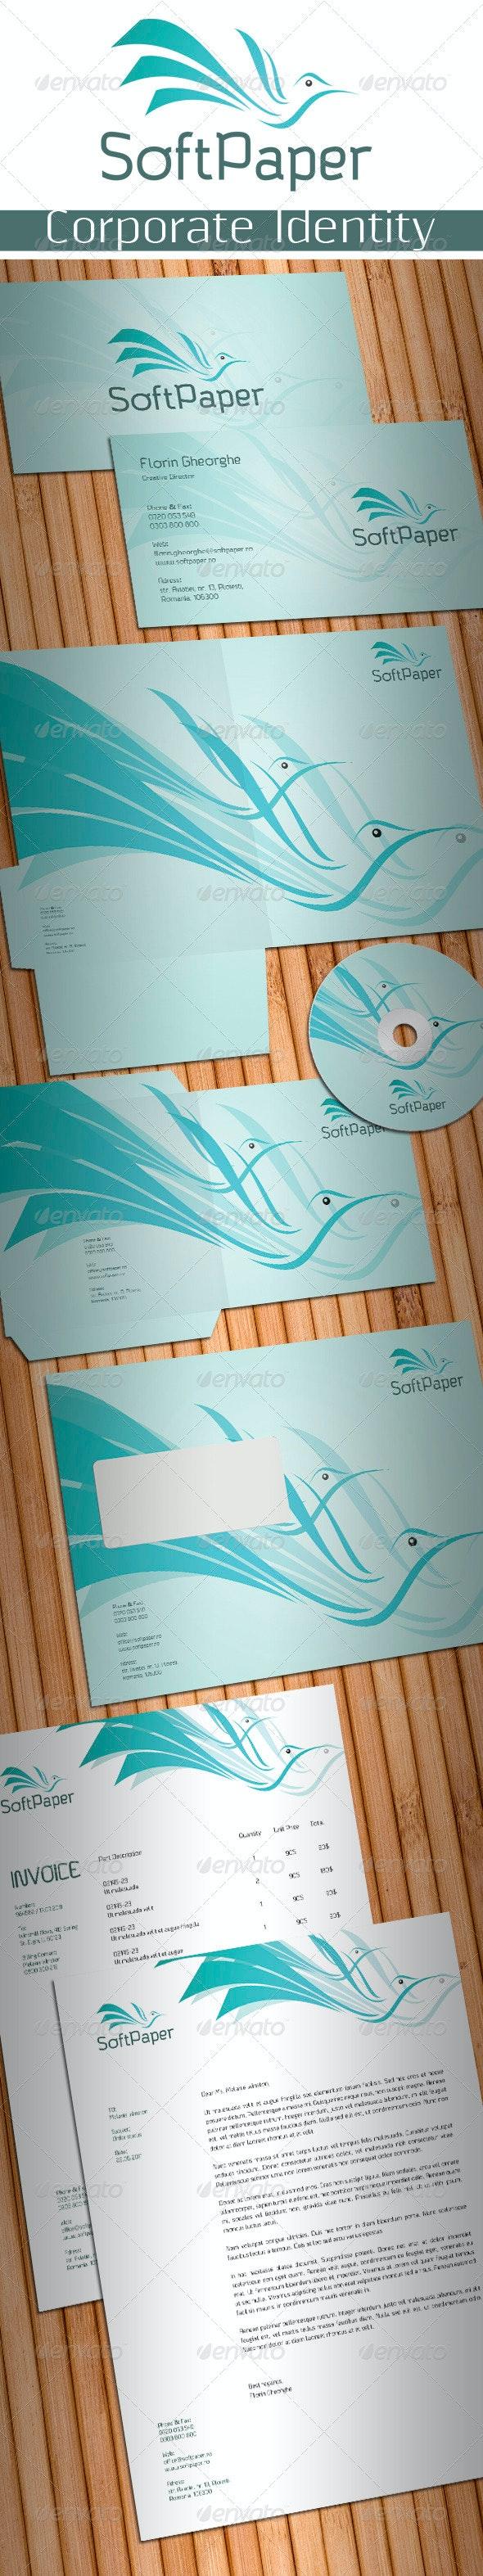 Soft Paper Stationery - Stationery Print Templates